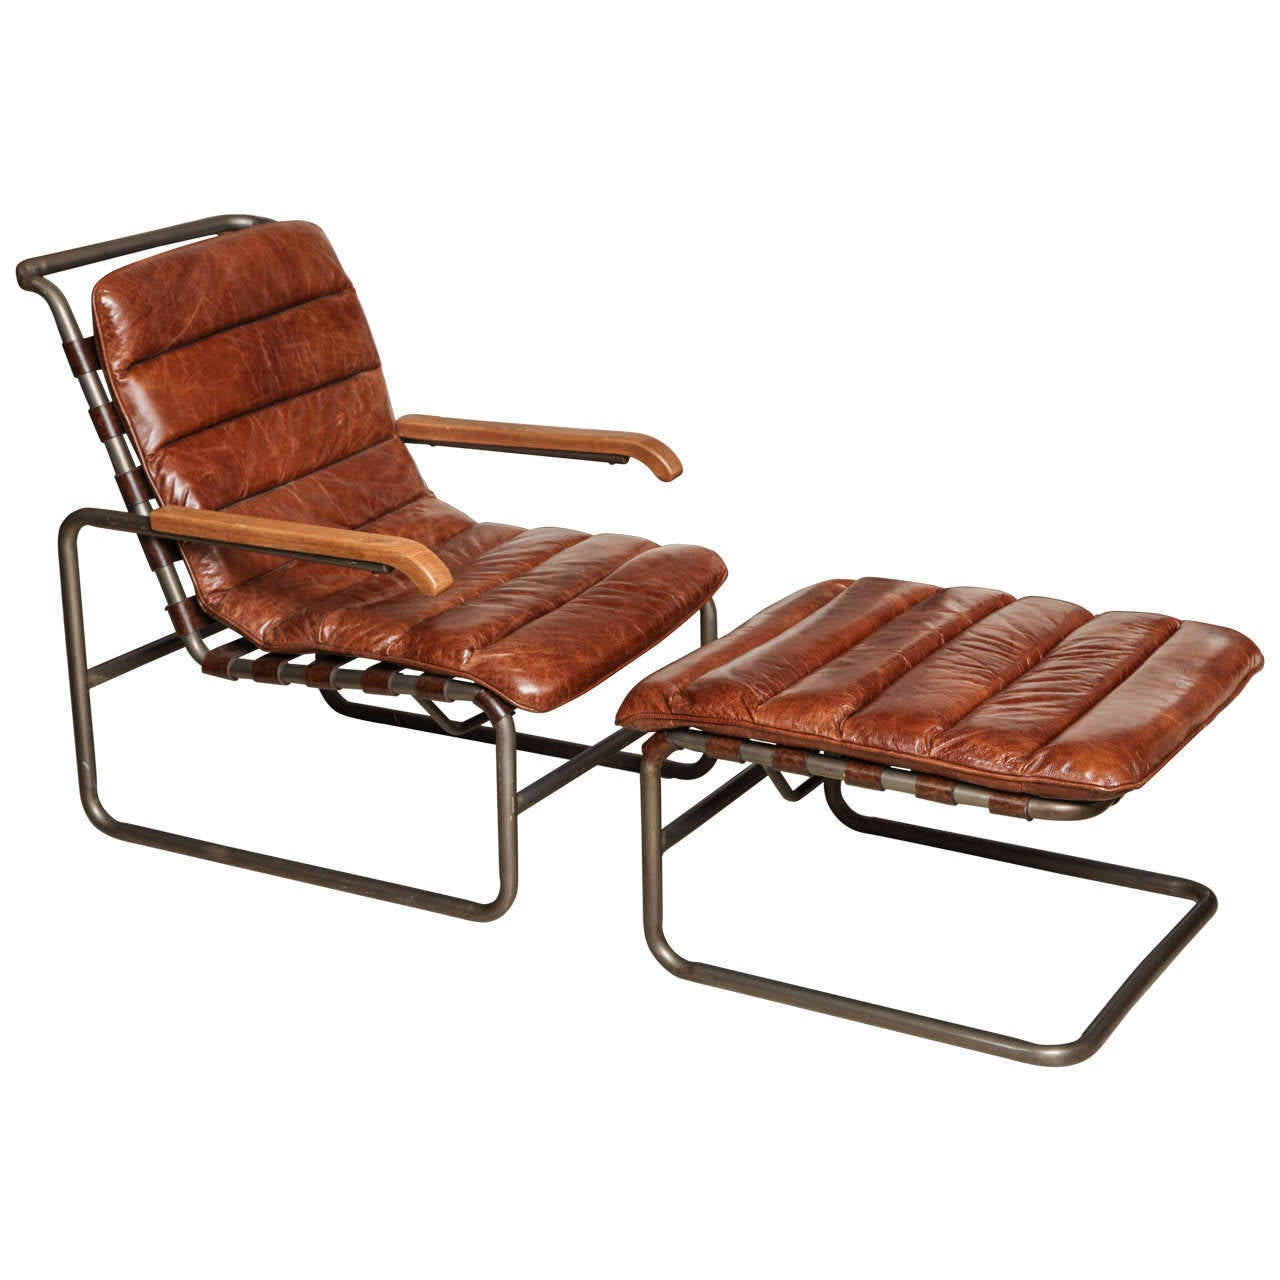 Bauhaus tubular steel lounge chair at 1stdibs - 20th Century Tubular Steel Chair And Ottoman Thonet 1